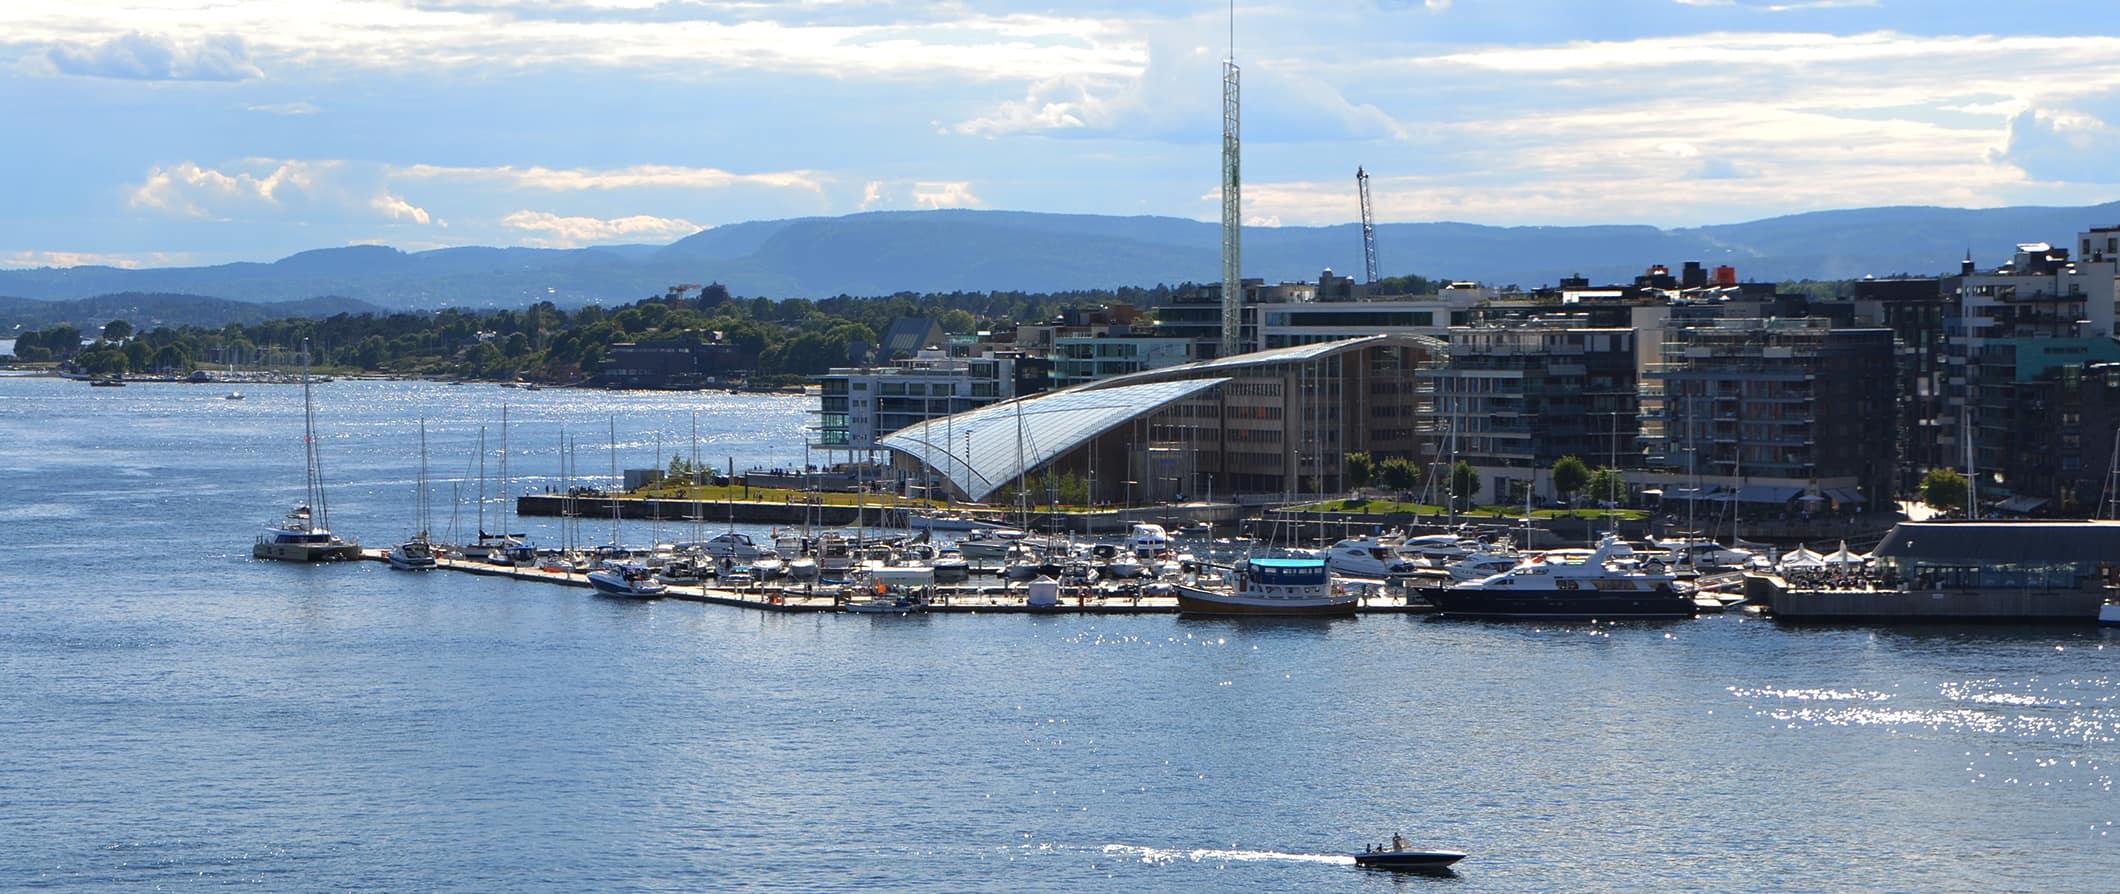 Oslo's skyline